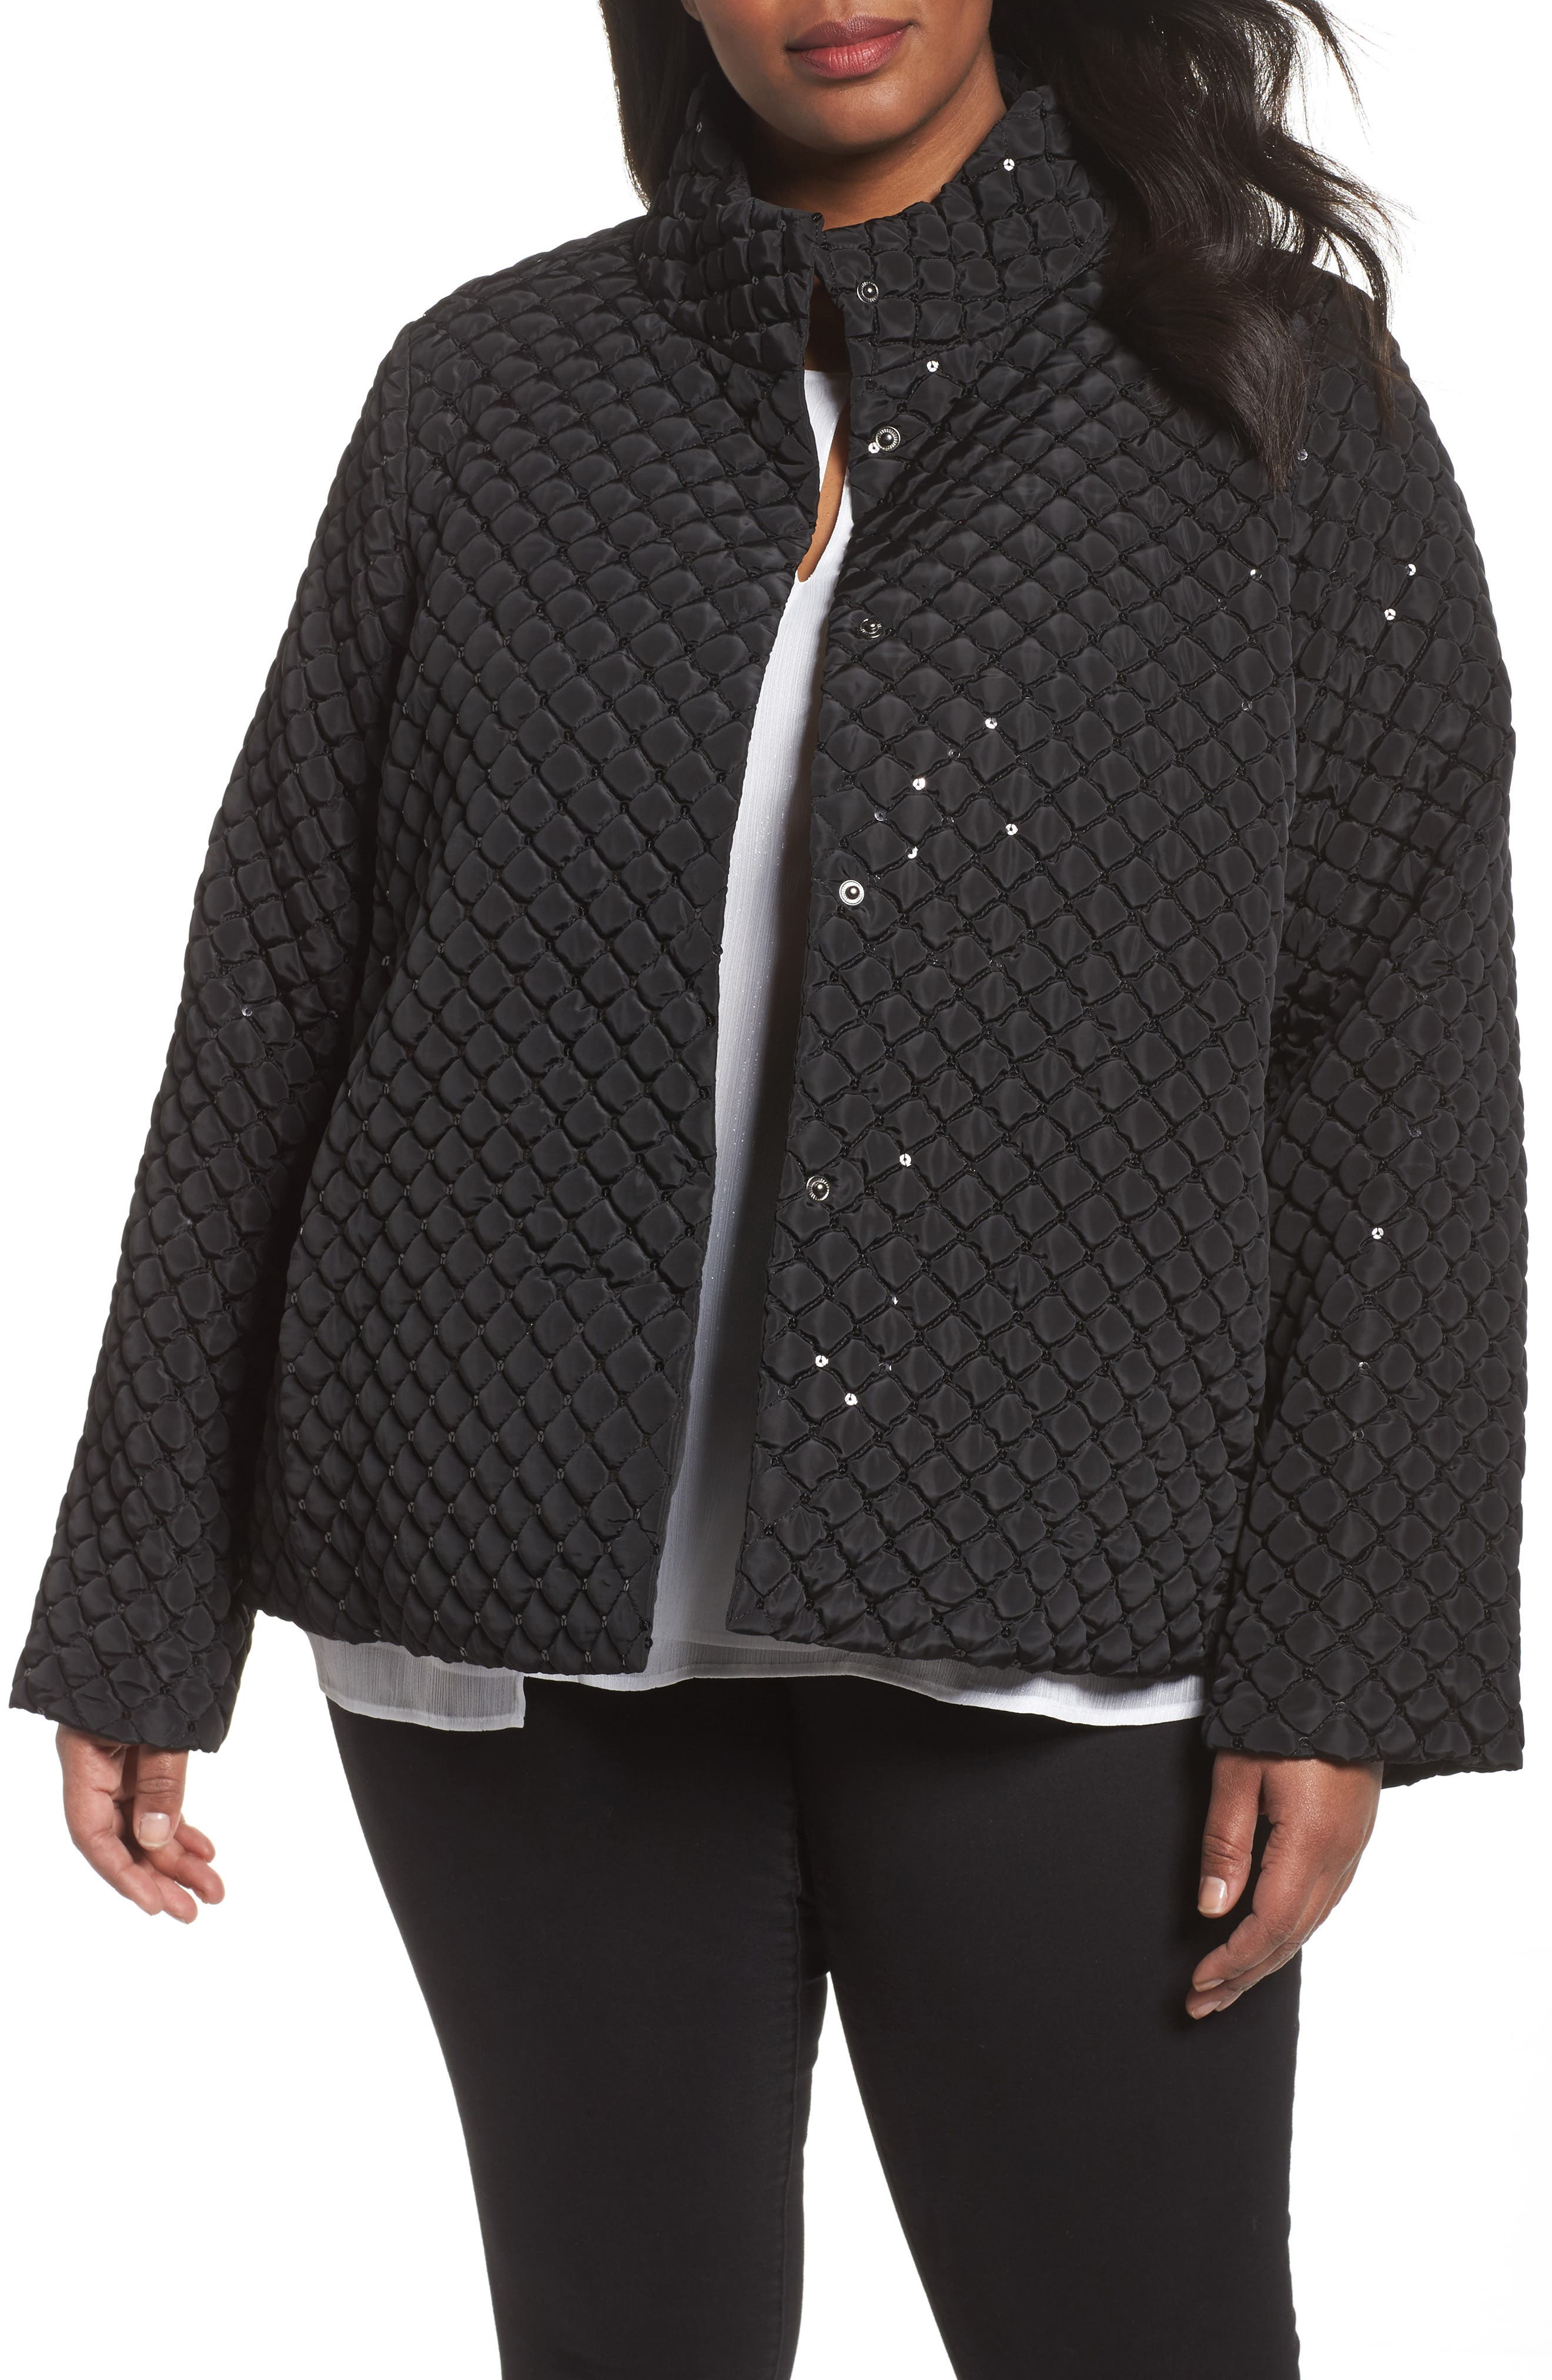 Papaia Sequin Jacket,                         Main,                         color, 001